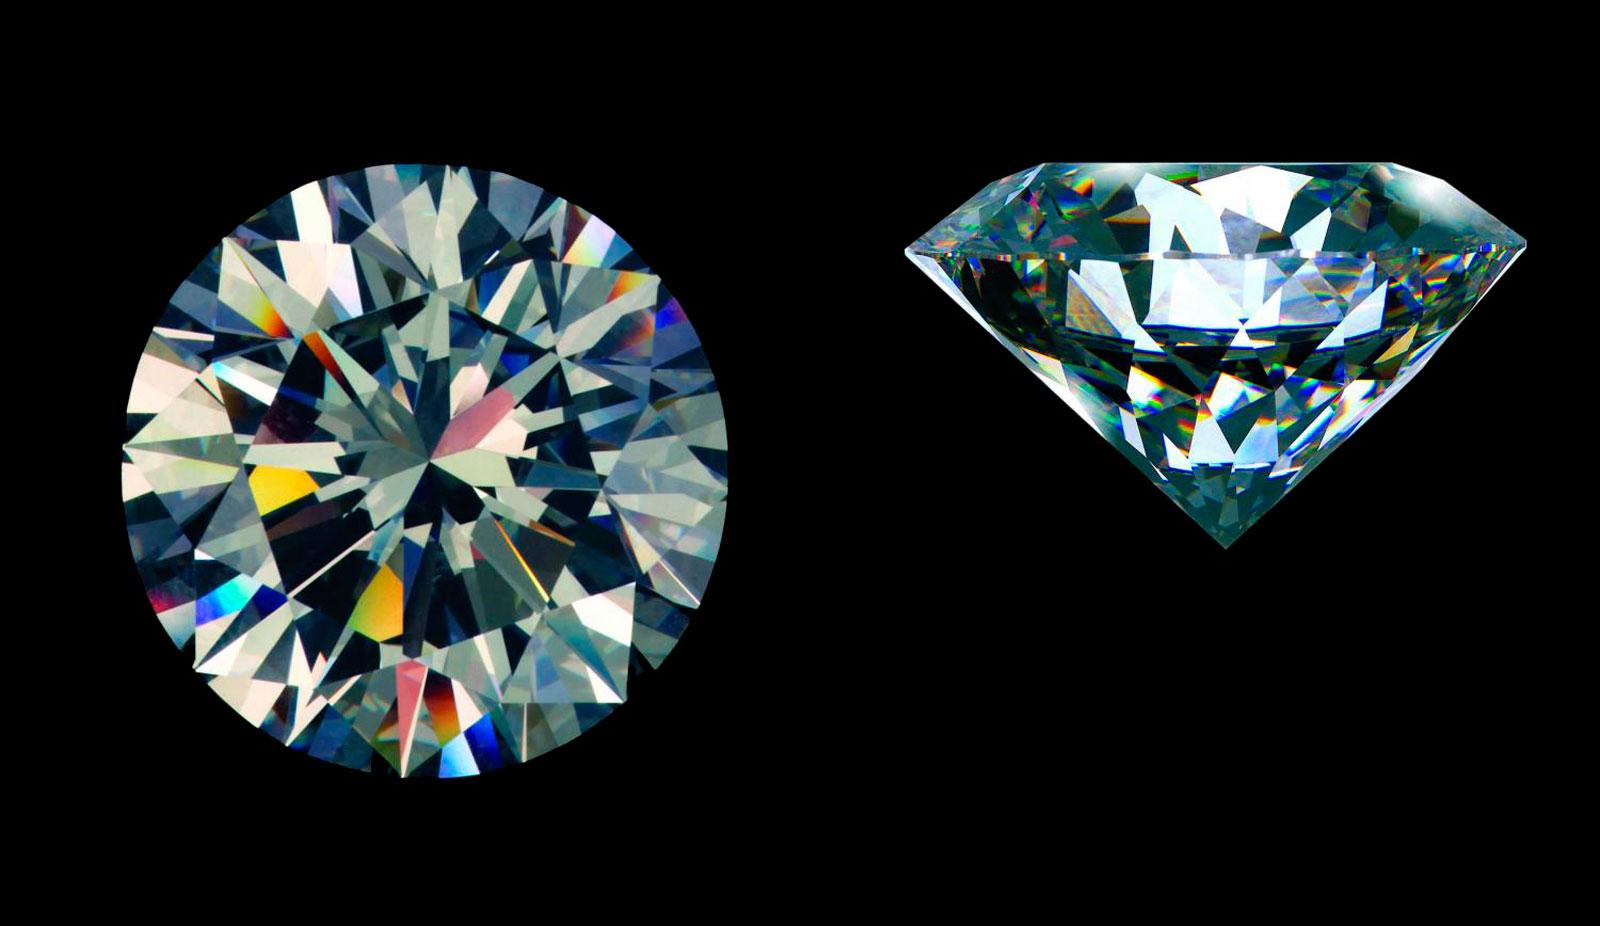 Rare Round Brilliant Cut Diamond Goes Under The Hammer At